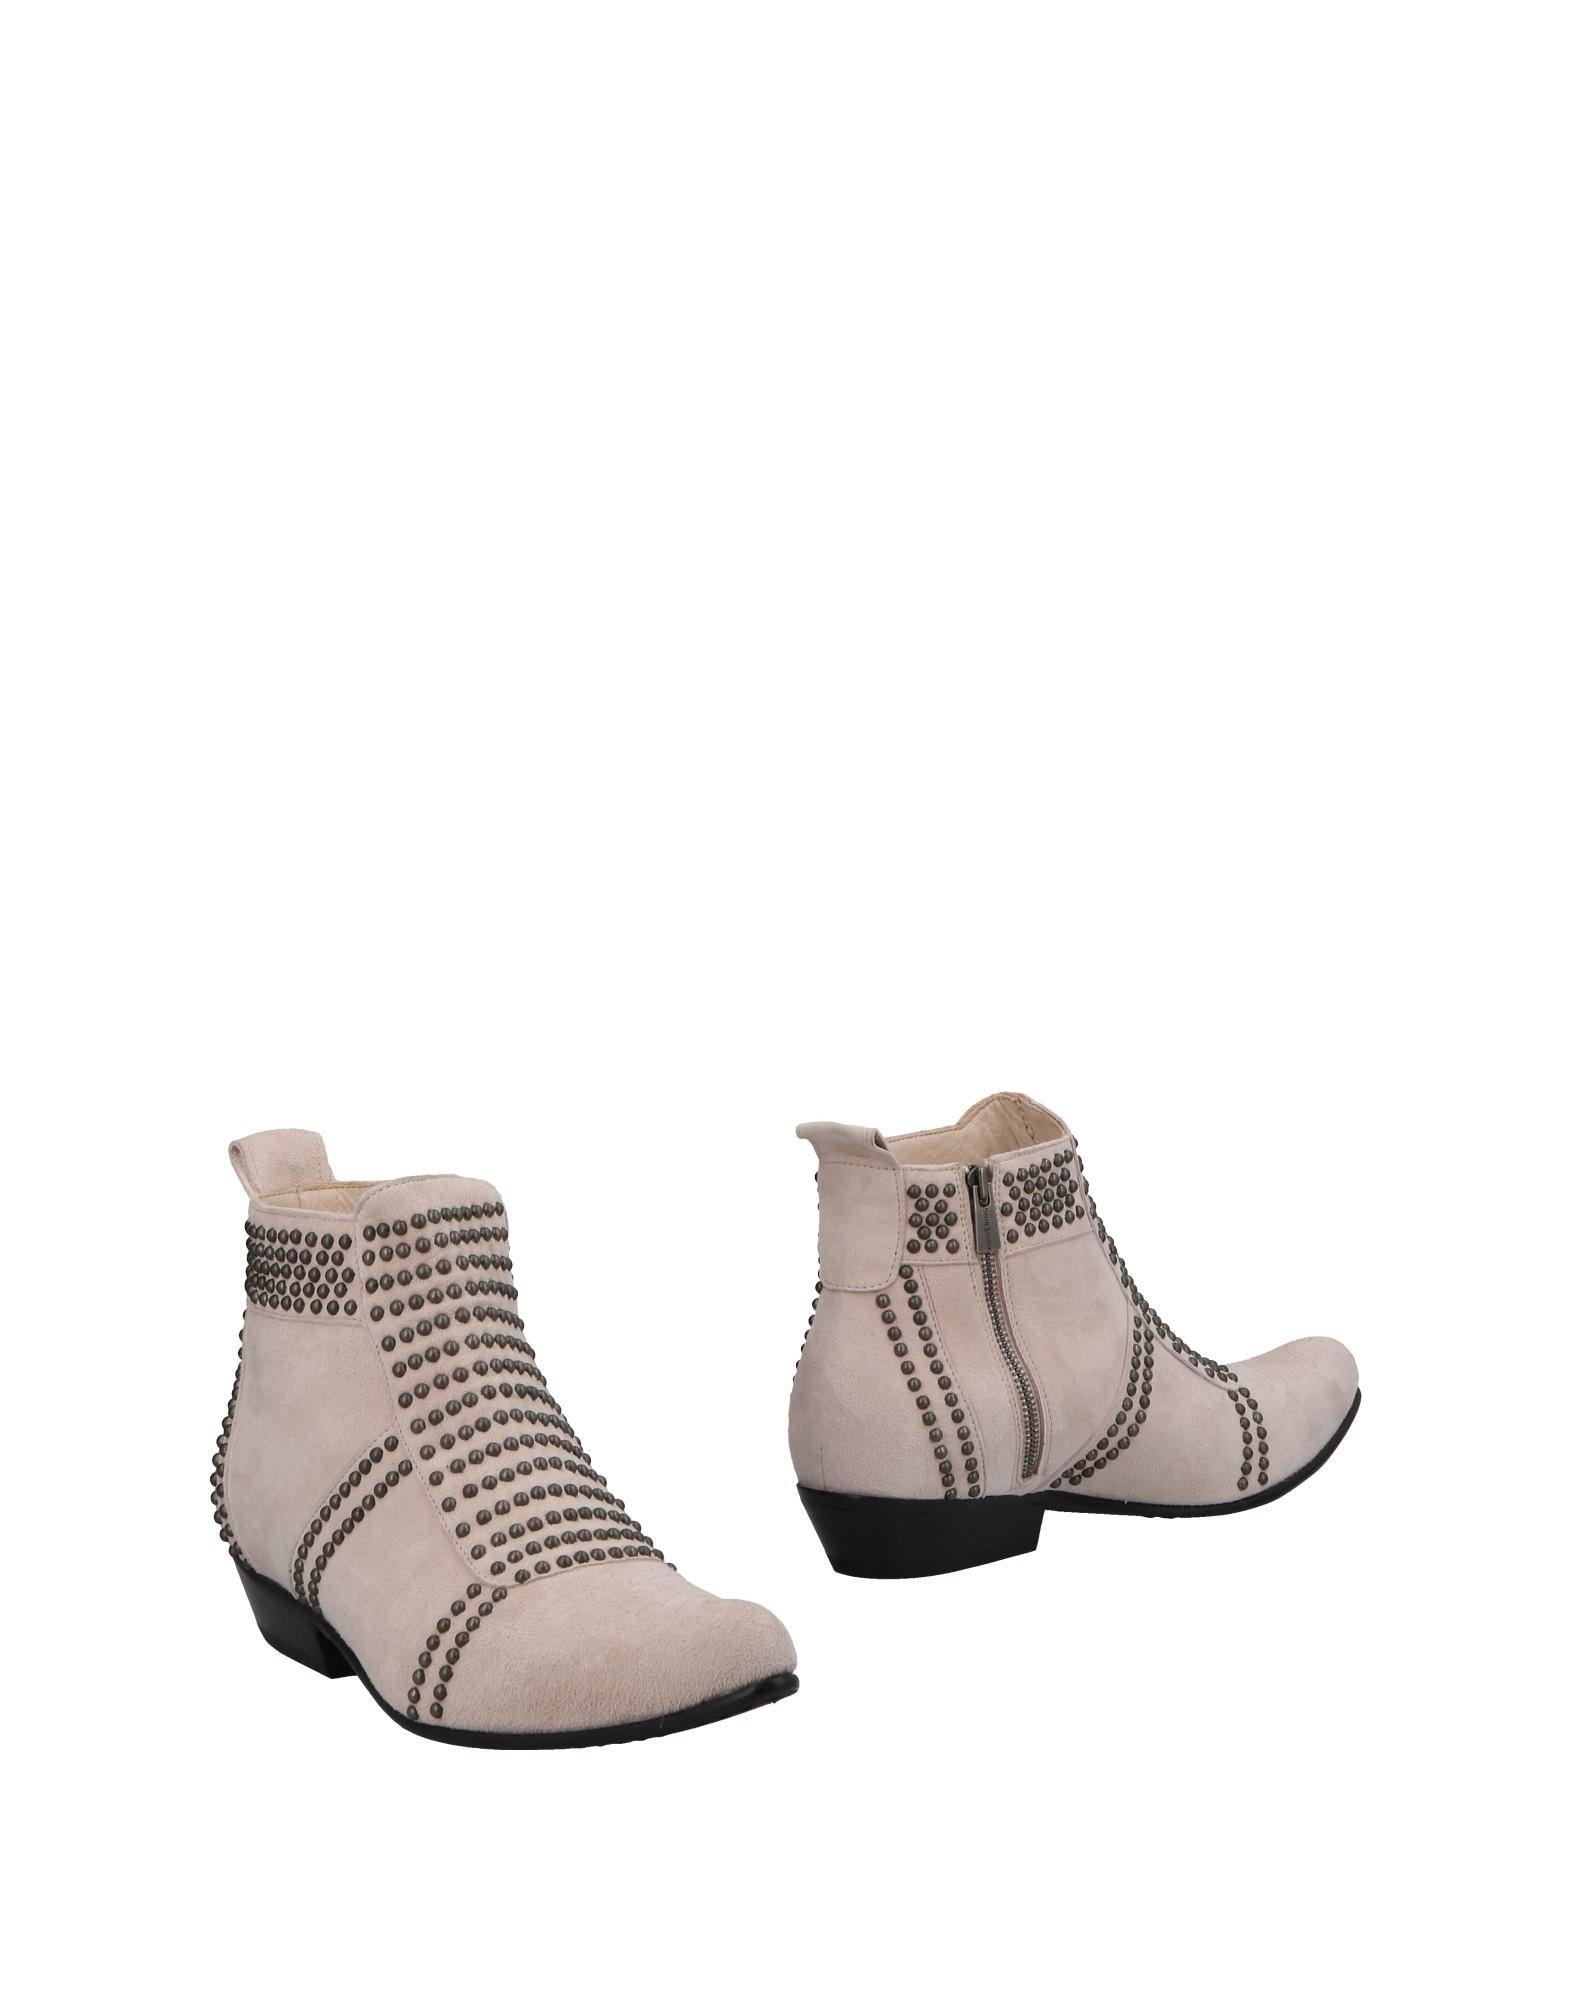 Bottine Anine Bing Femme - Bottines Anine Bing Gris tourterelle Chaussures casual sauvages